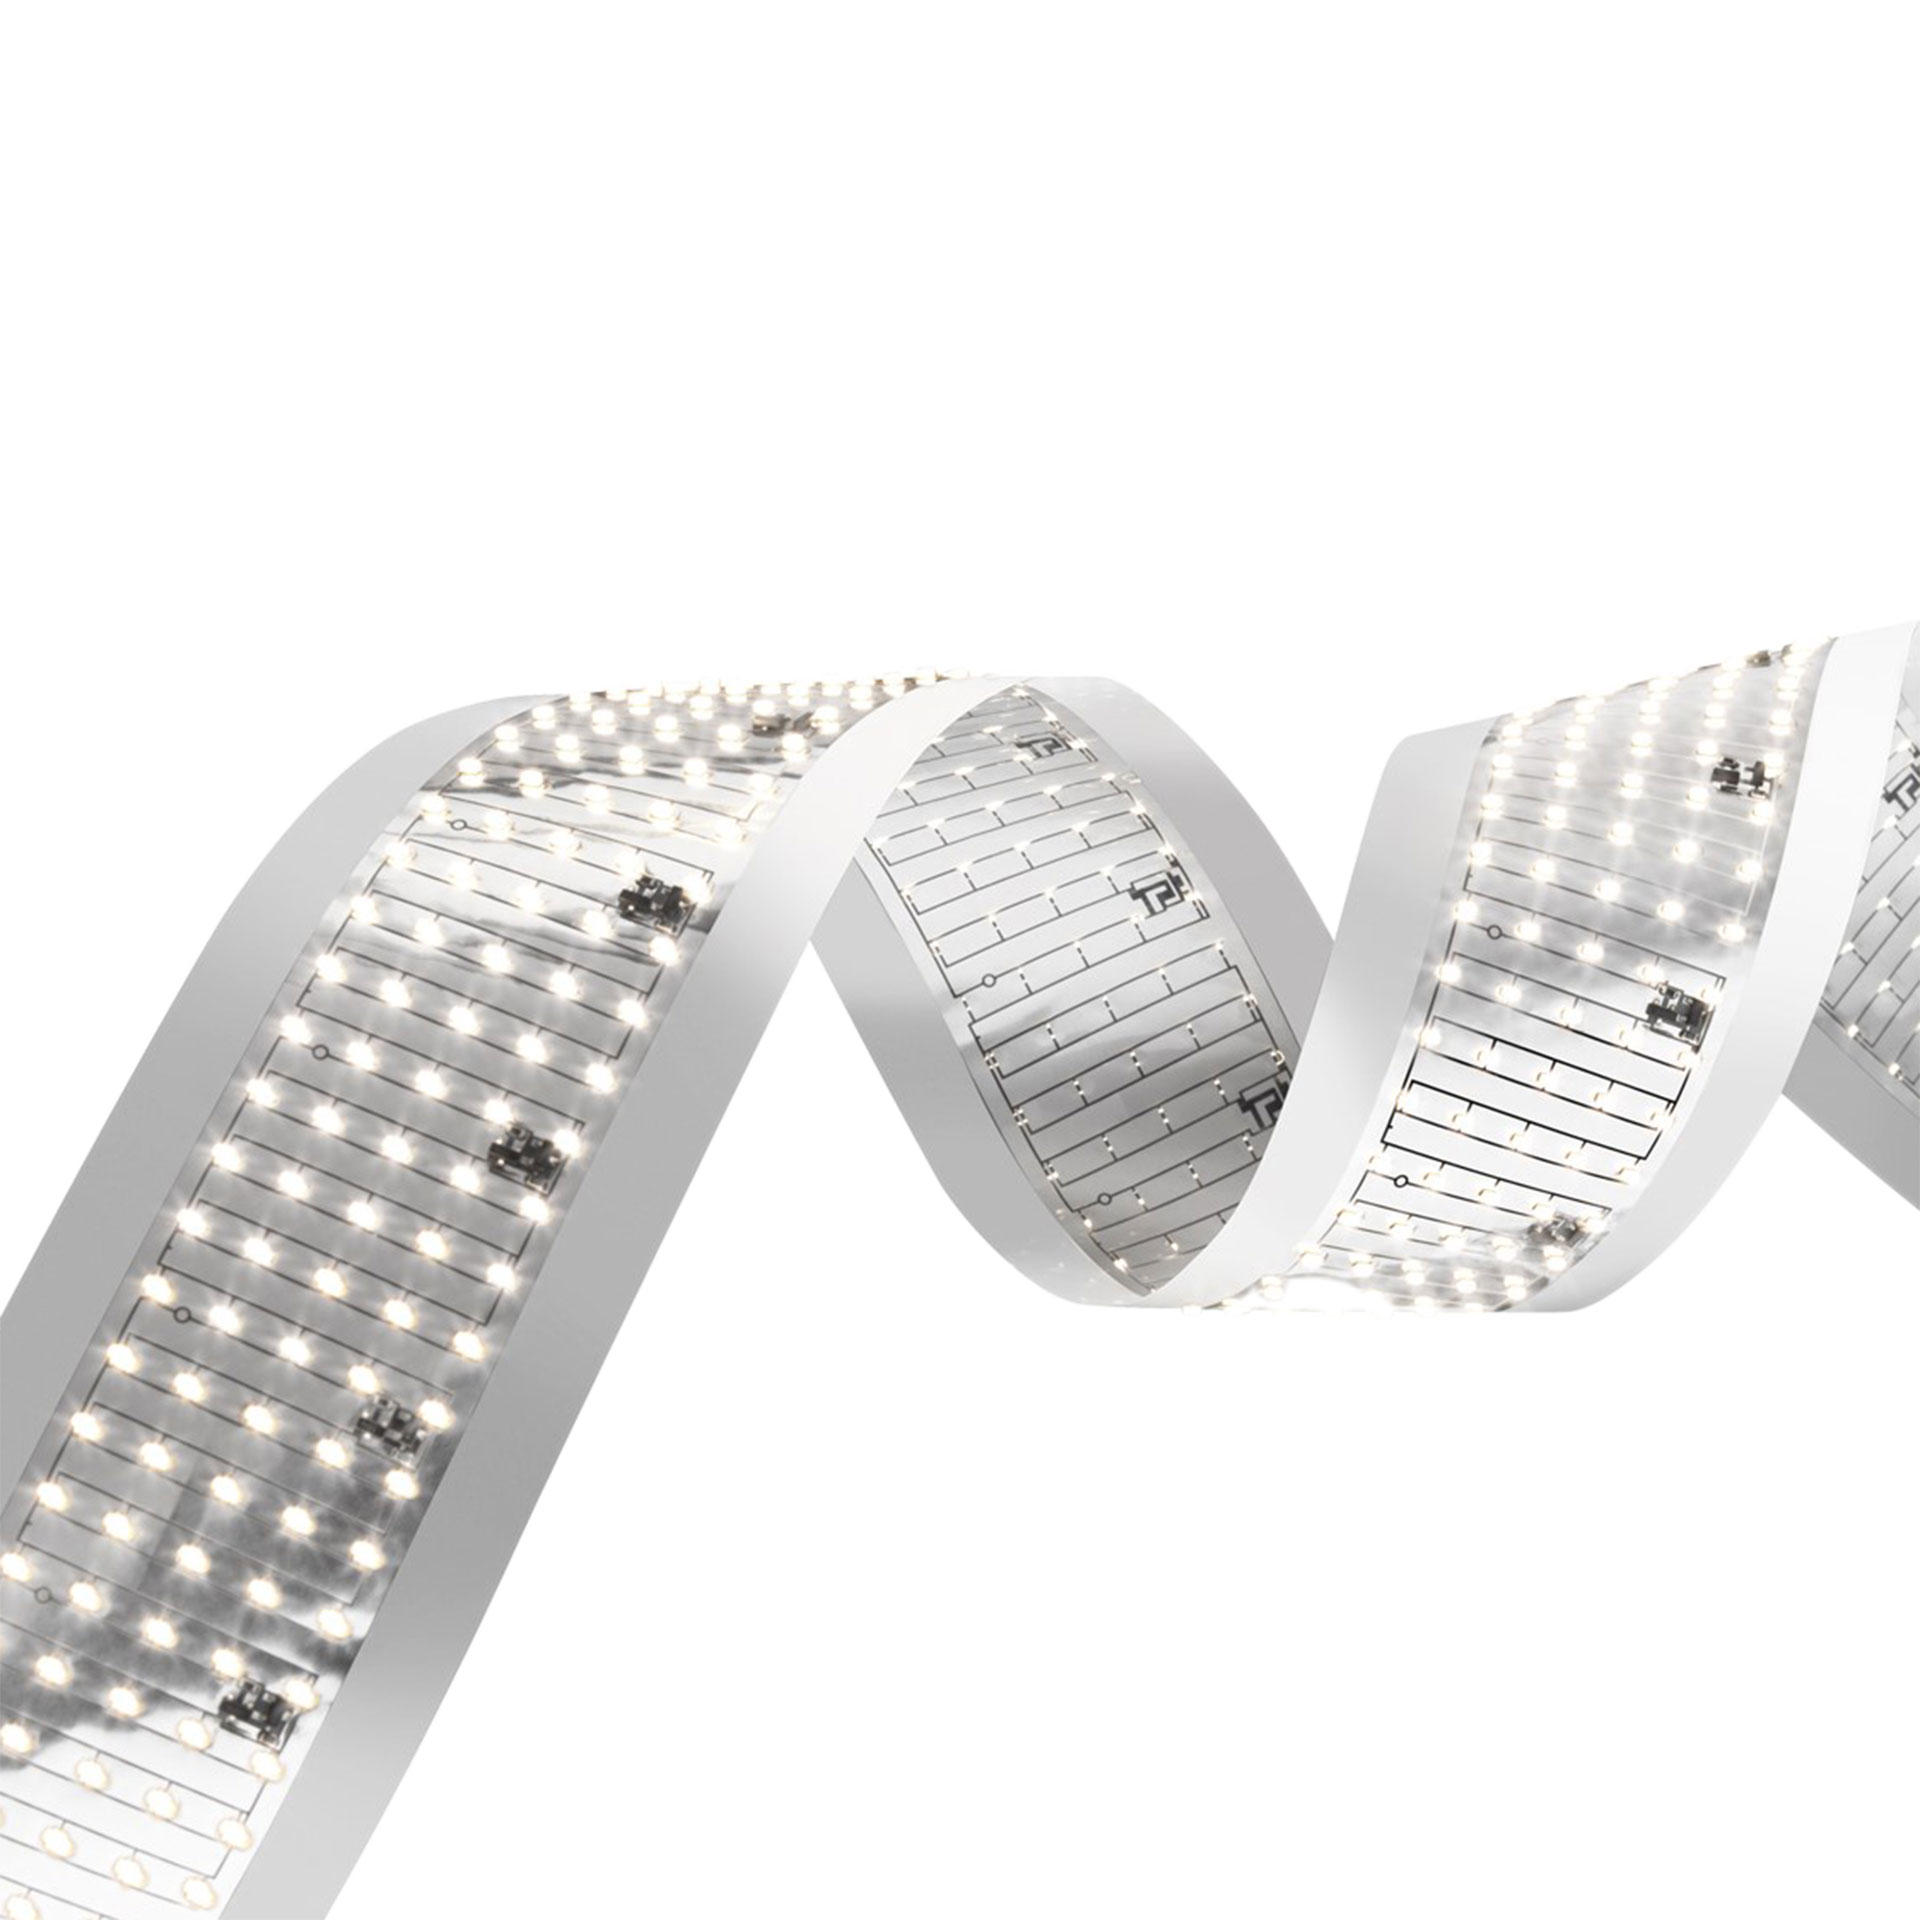 Cooledge Modules For Backlighting Interiors Led Futuro Luce